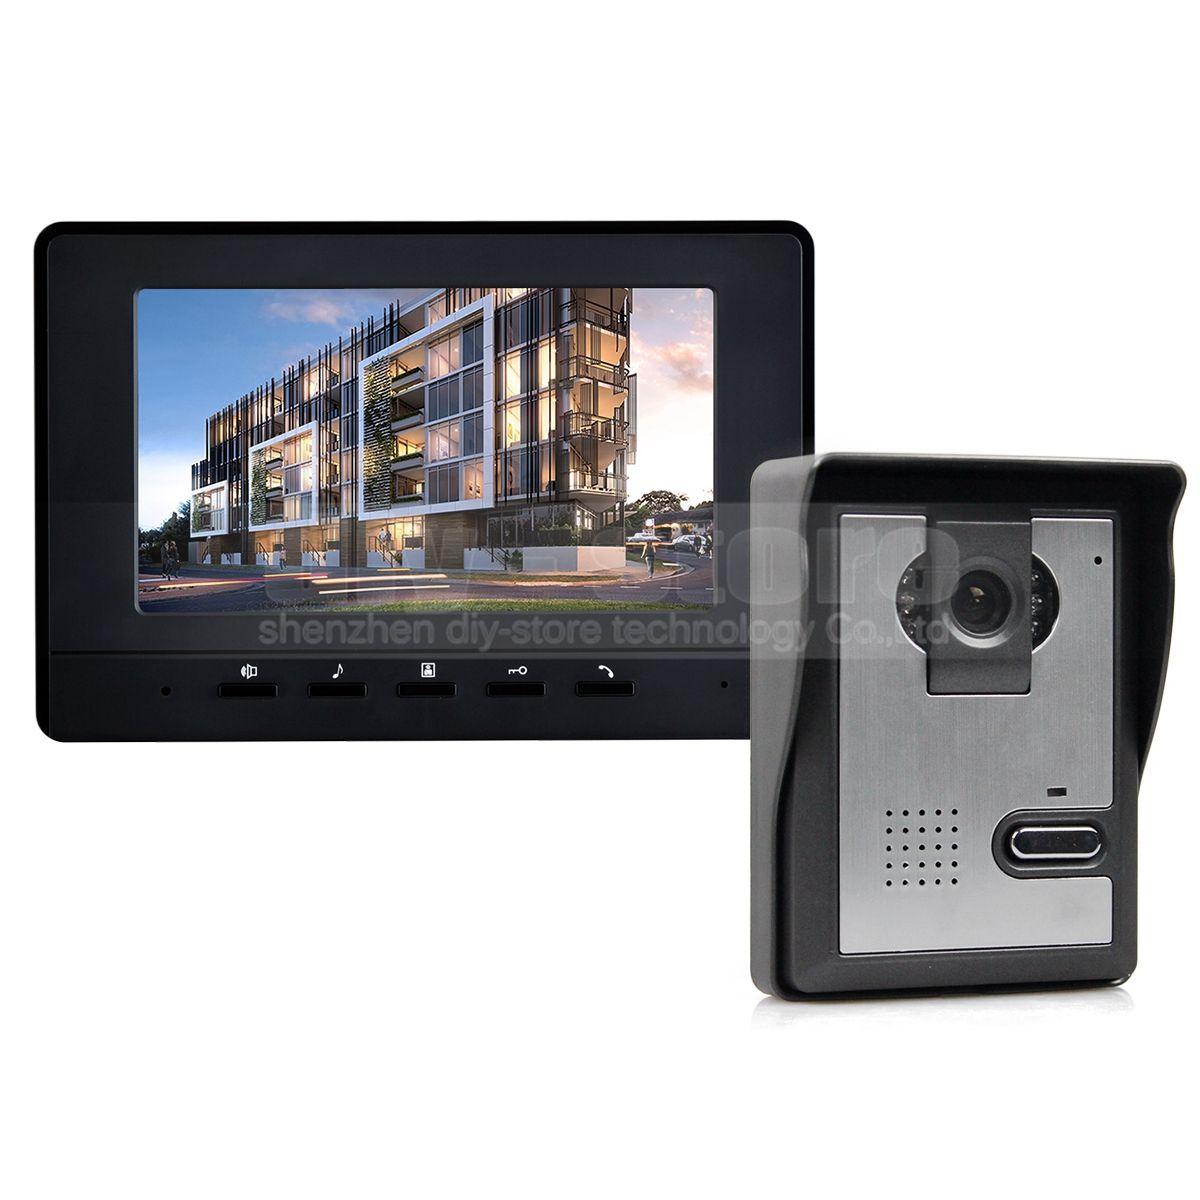 großhandel diysecur 7 zoll video intercom video türsprechanlage